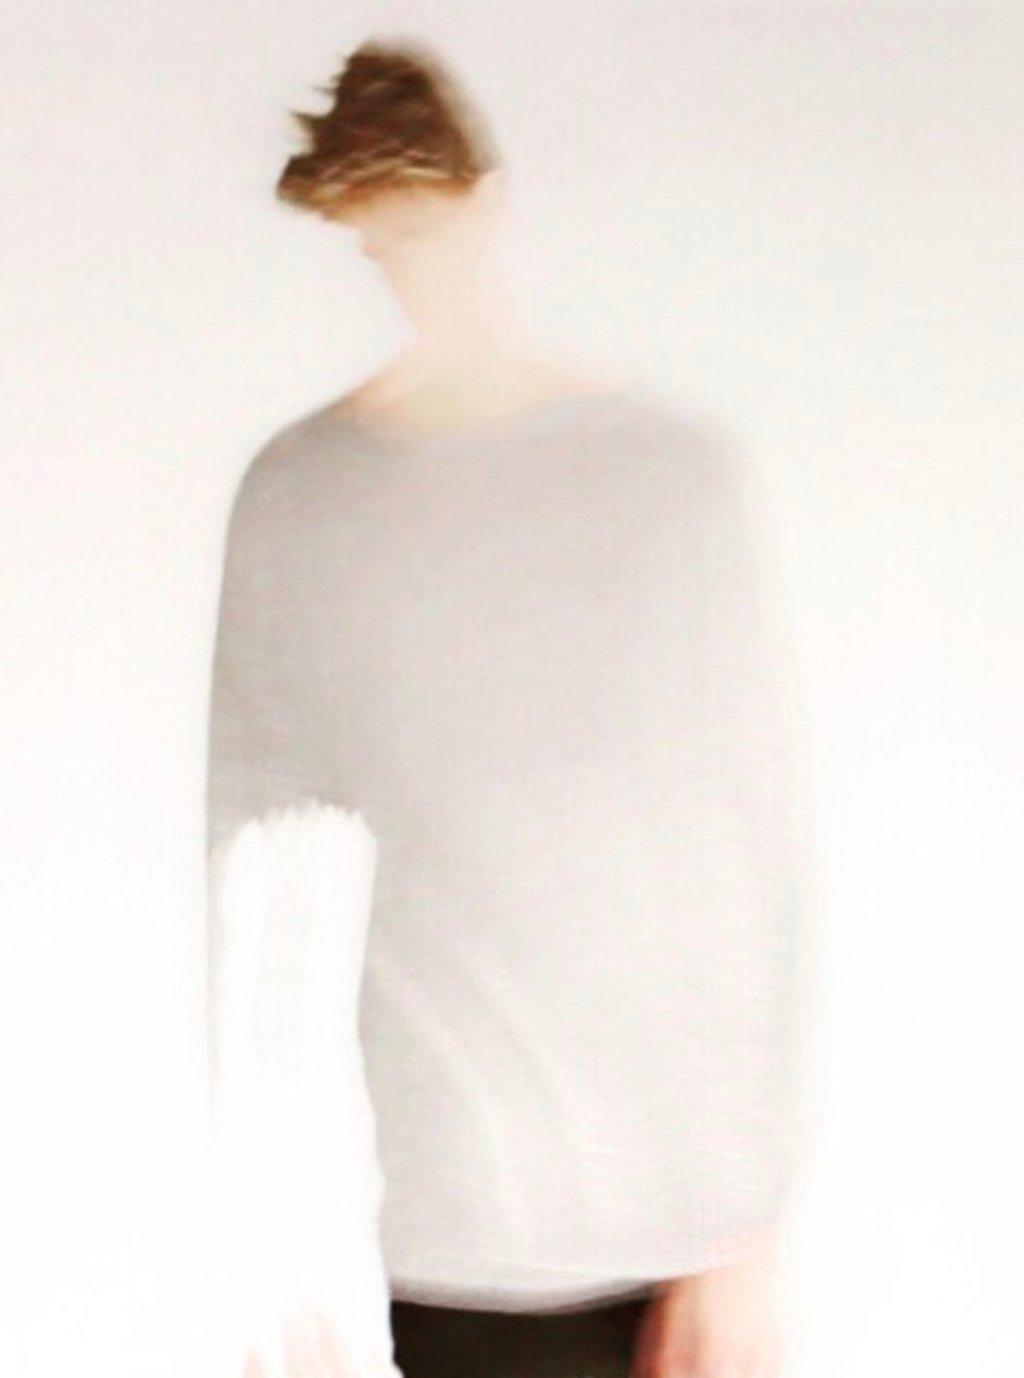 Faded photograph by joemuli